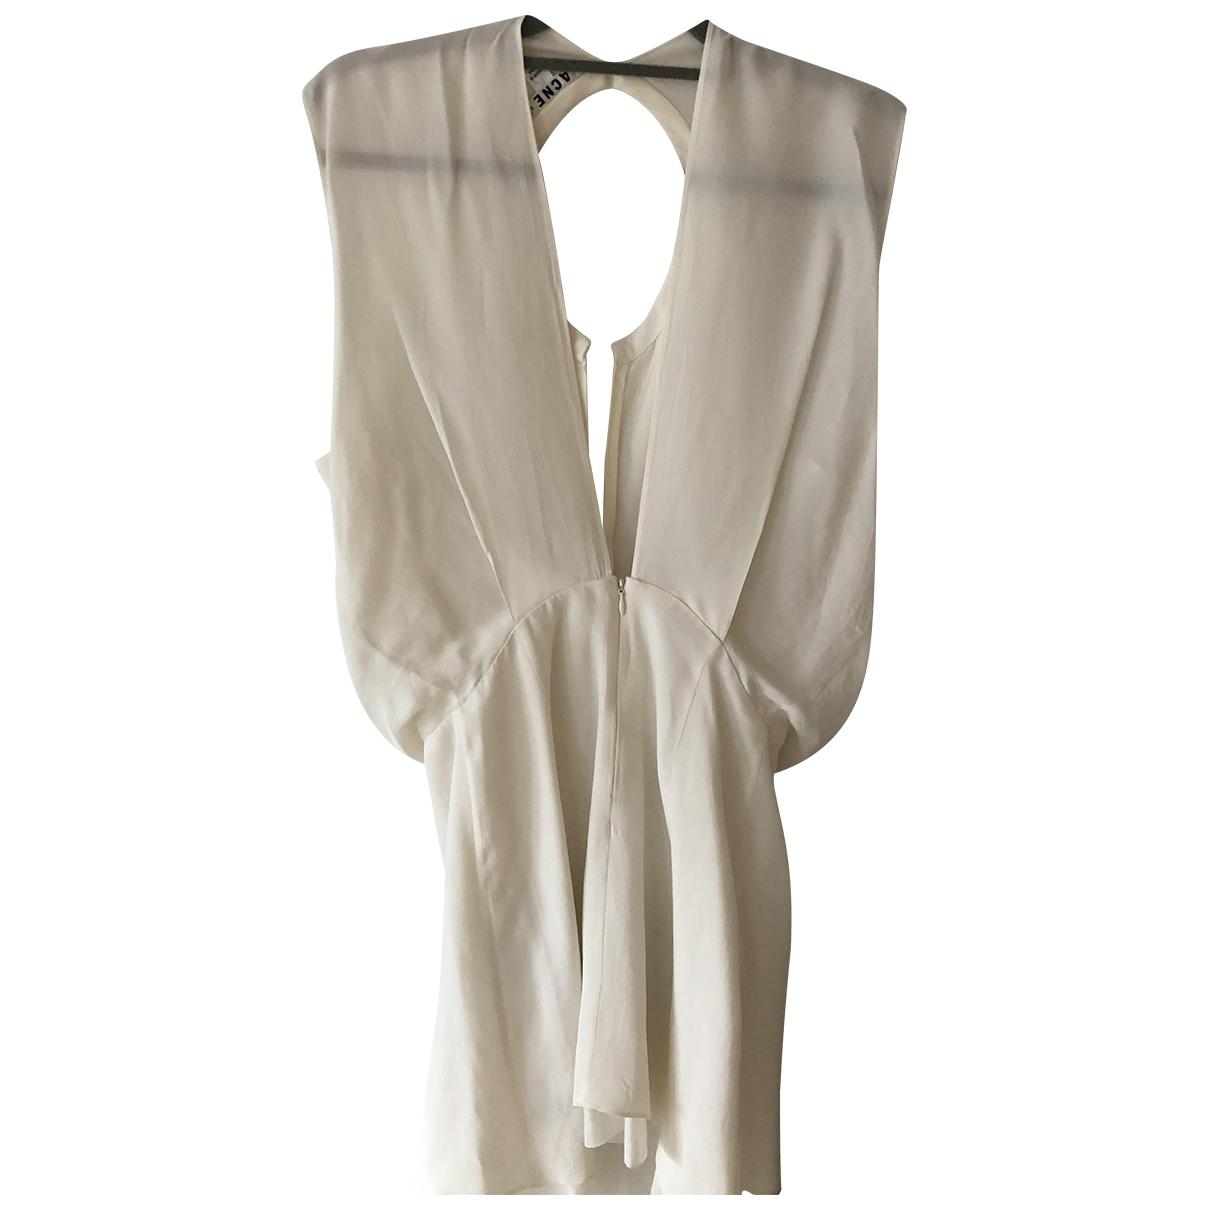 Acne Studios \N White Cotton - elasthane dress for Women S International